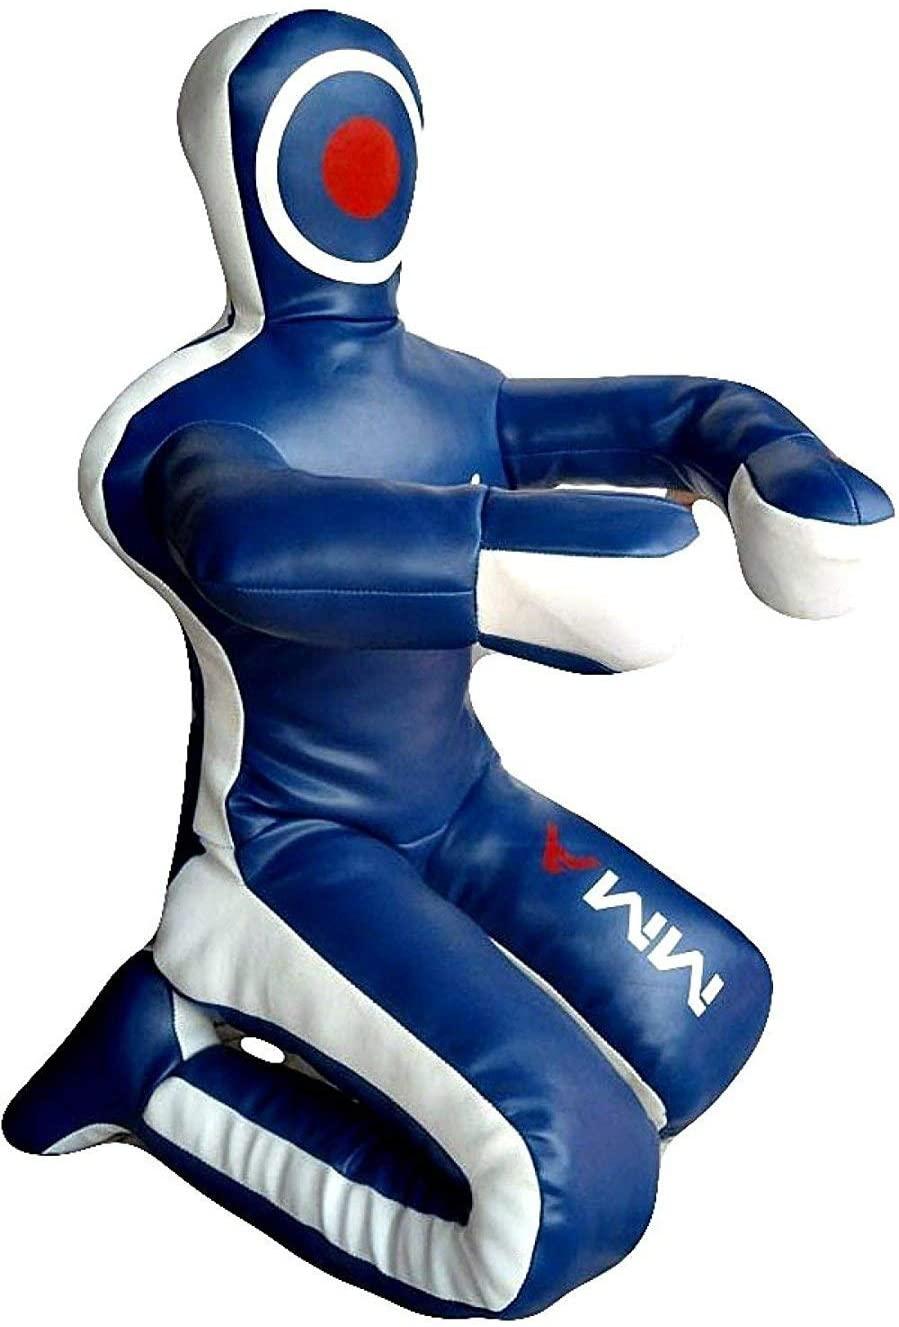 LEATHERAY MMA Martial Arts Brazilian Grappling Dummy Jiu Jitsu Punching Bag Sitting Position Blue-Unfilled Hands on Front